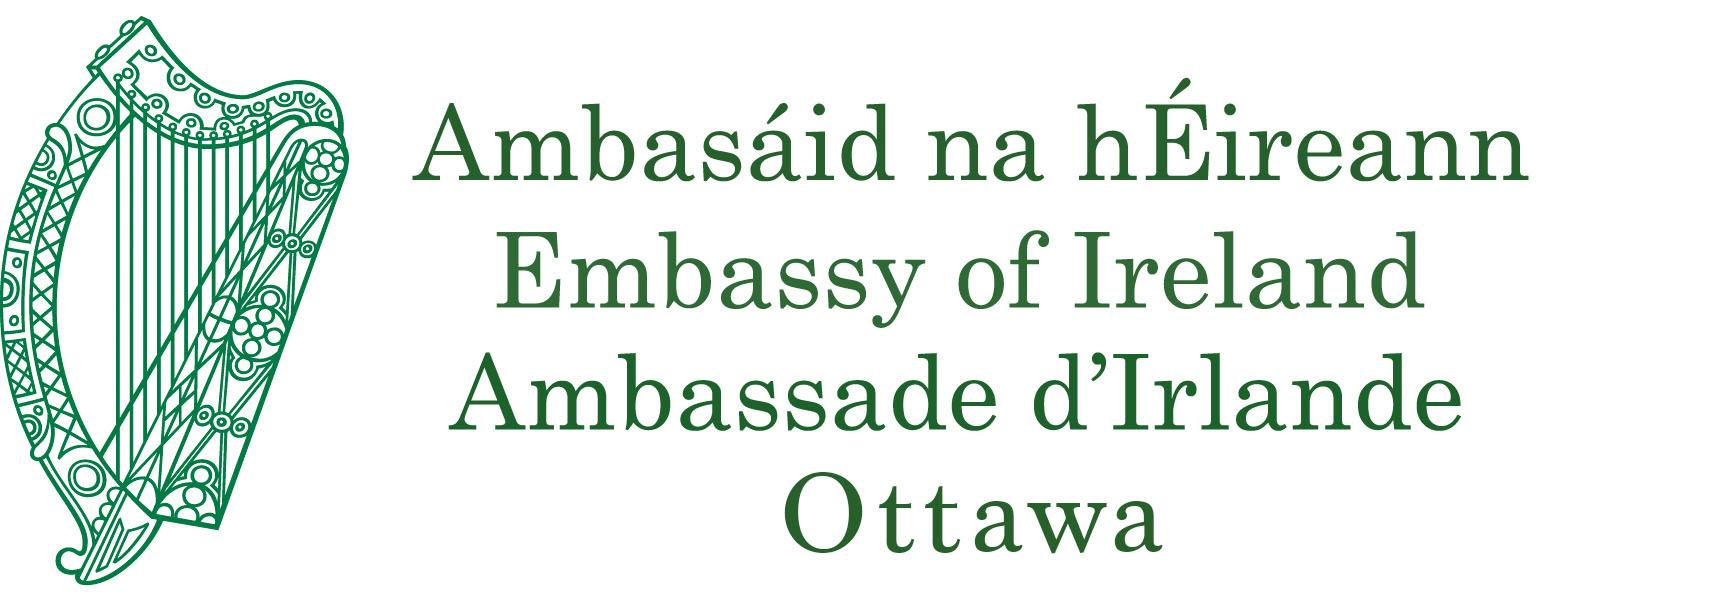 Embassy of Ireland